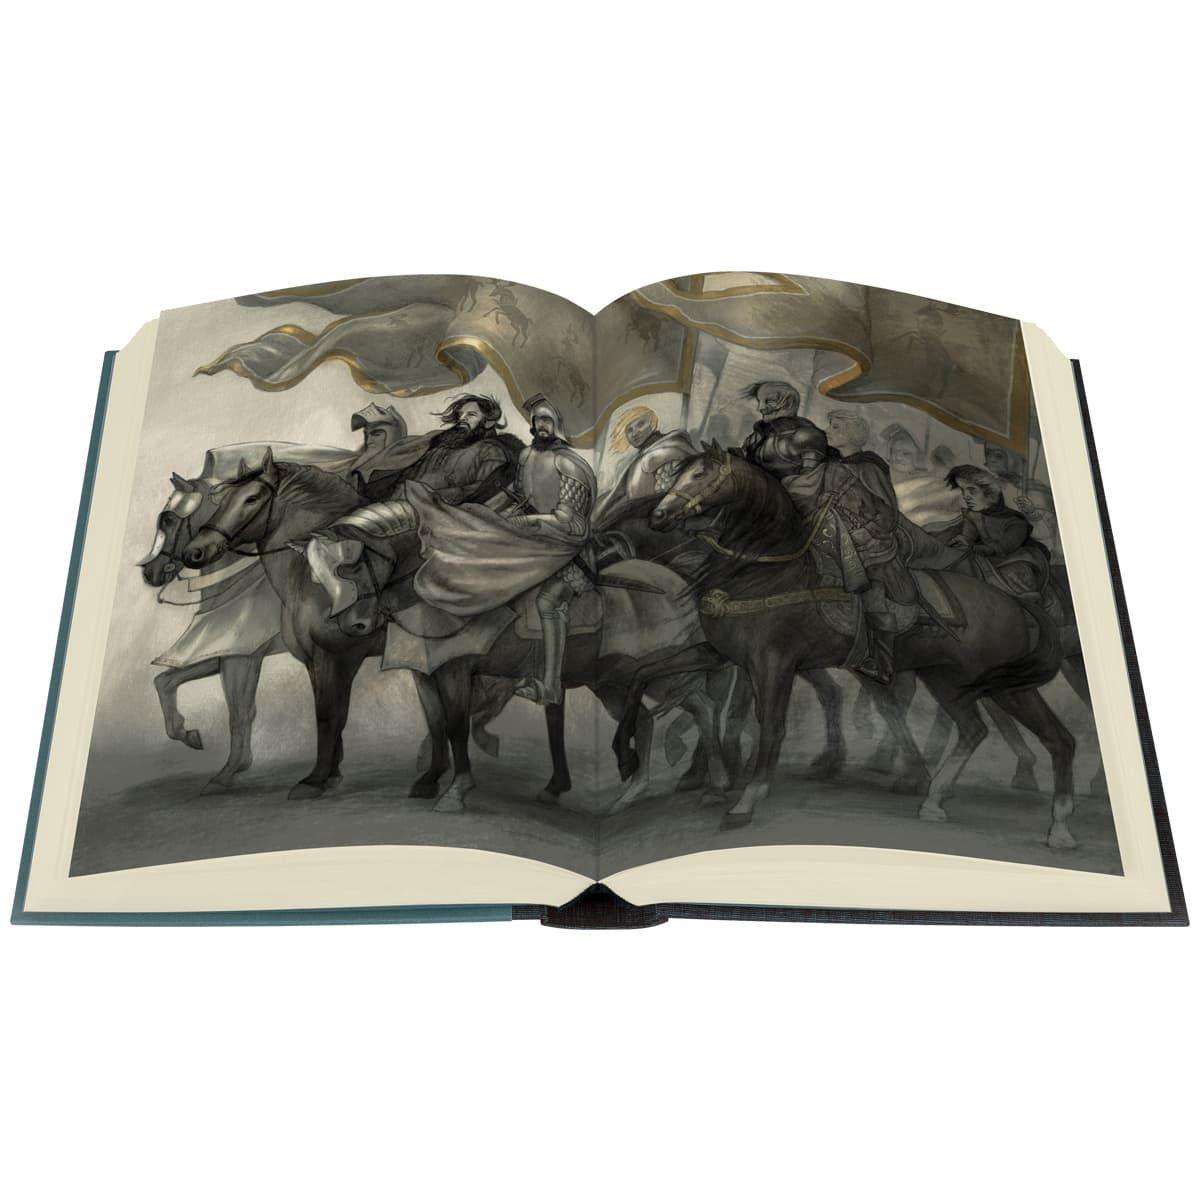 Une Edition Deluxe De A Game Of Thrones Vo Pour Cet